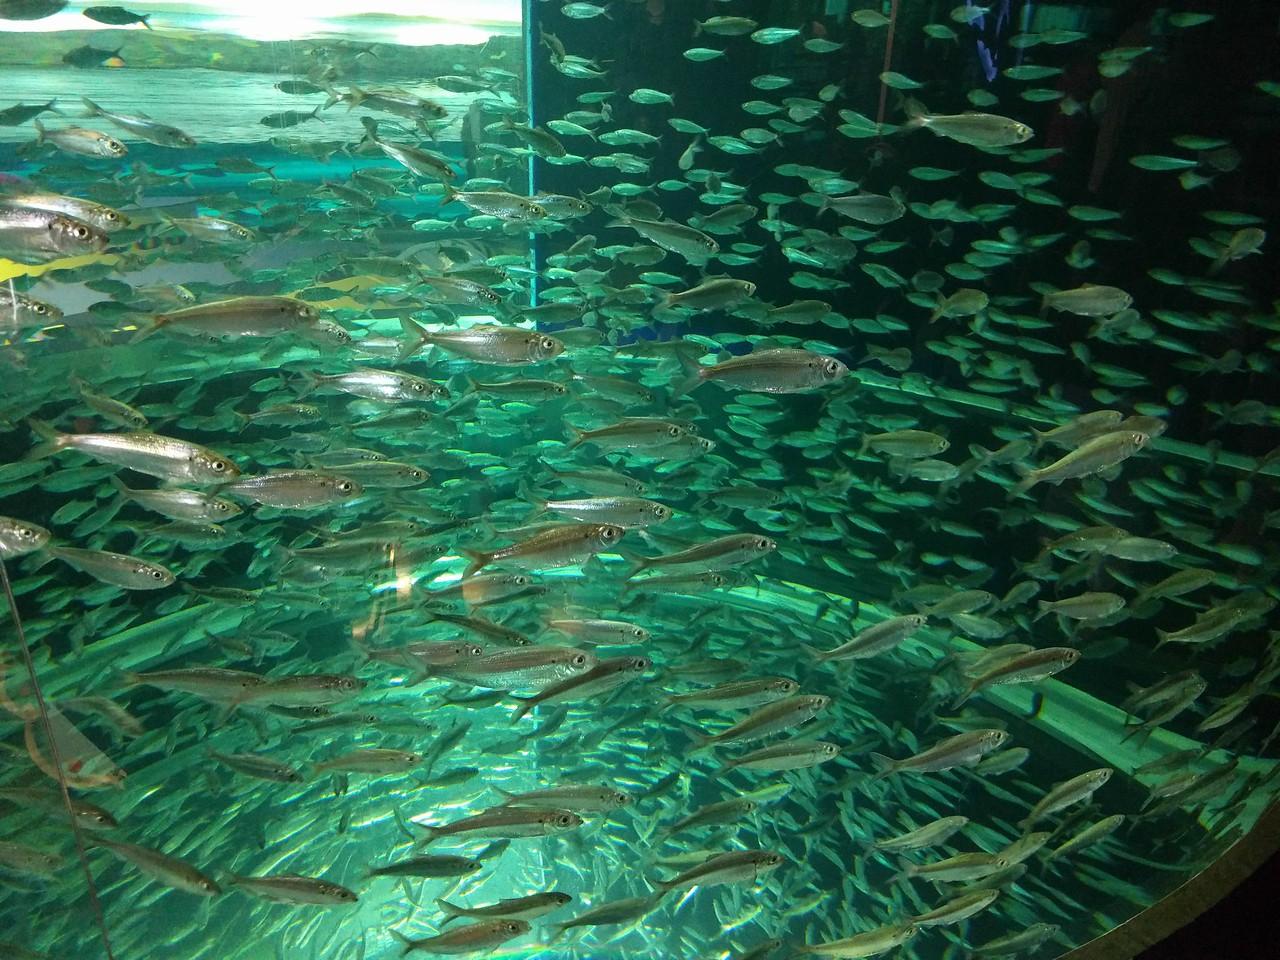 028 - Toronto - Aquarium - Lots of Alewives